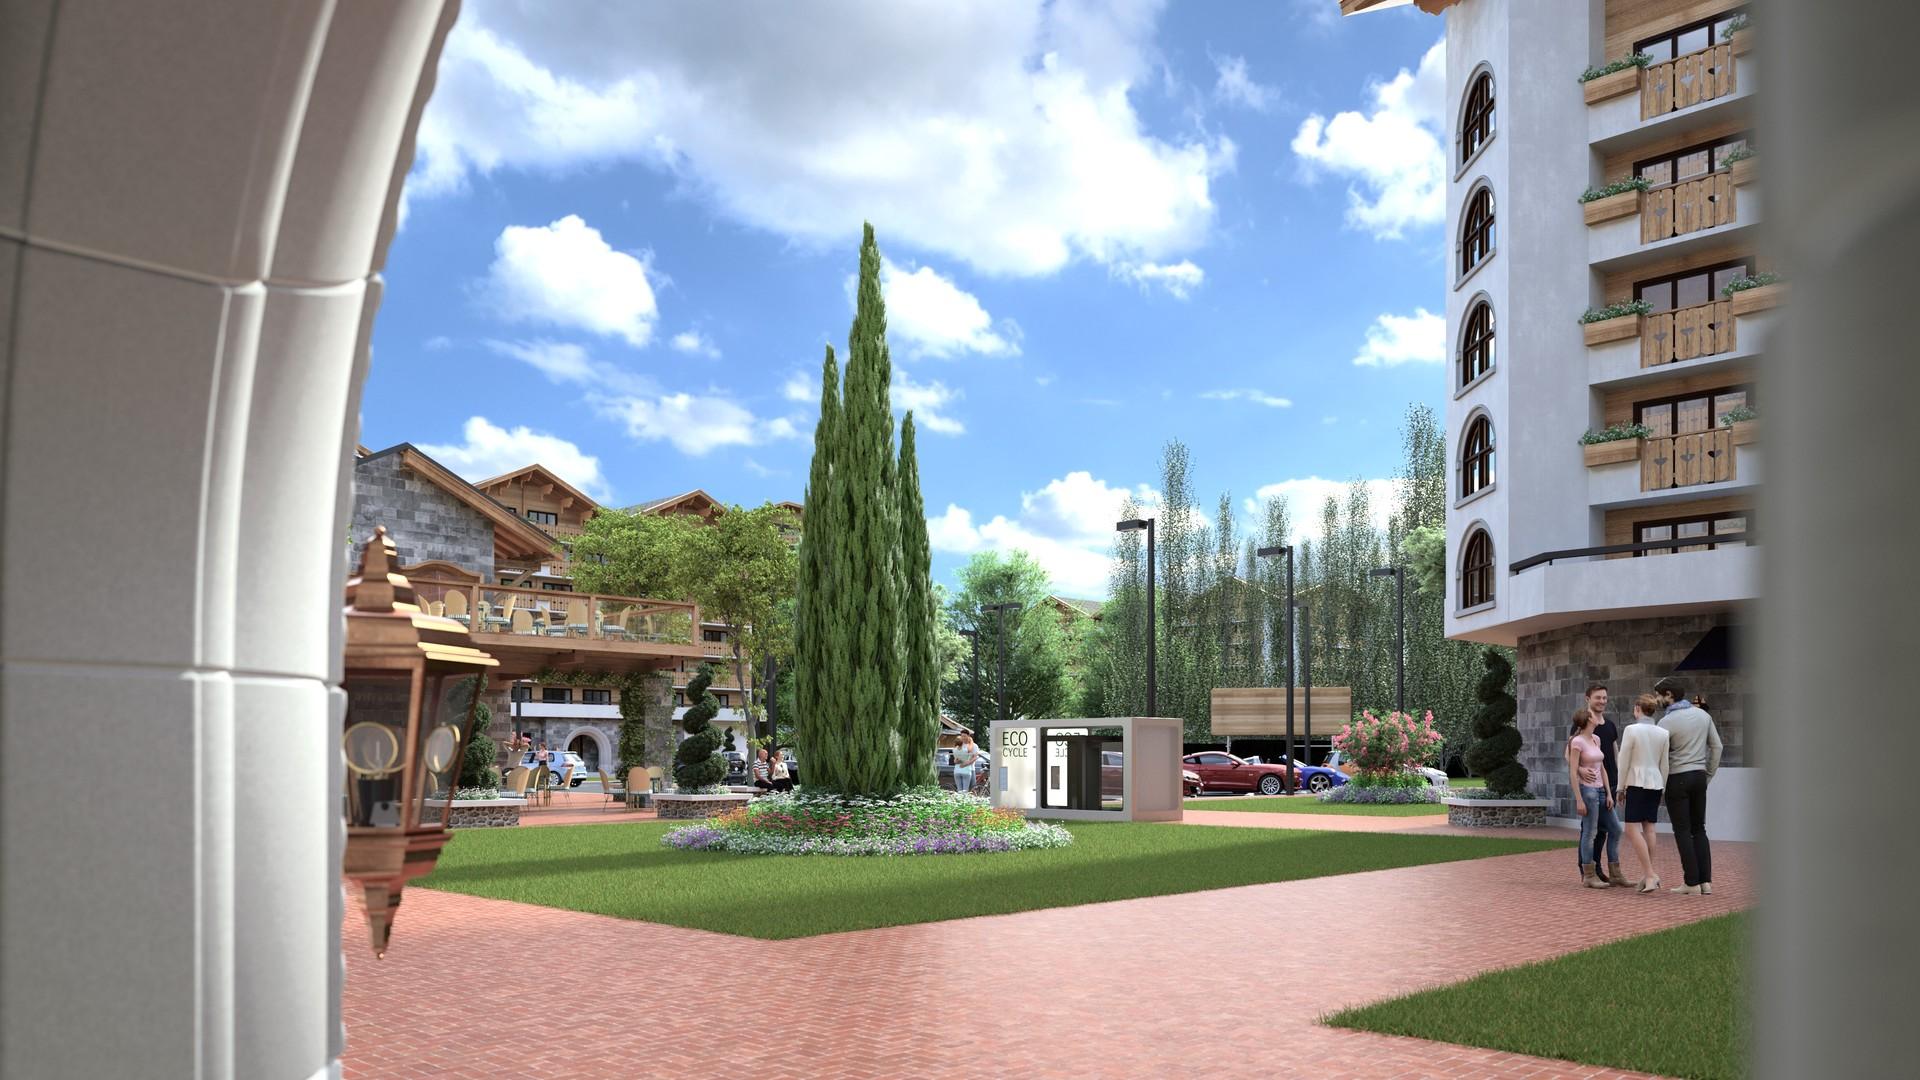 Duane kemp 03 eco cycle alpine hotel v2017 scene 75 3840x2160 3h35m hdr241 v2 fp2900zg crf d